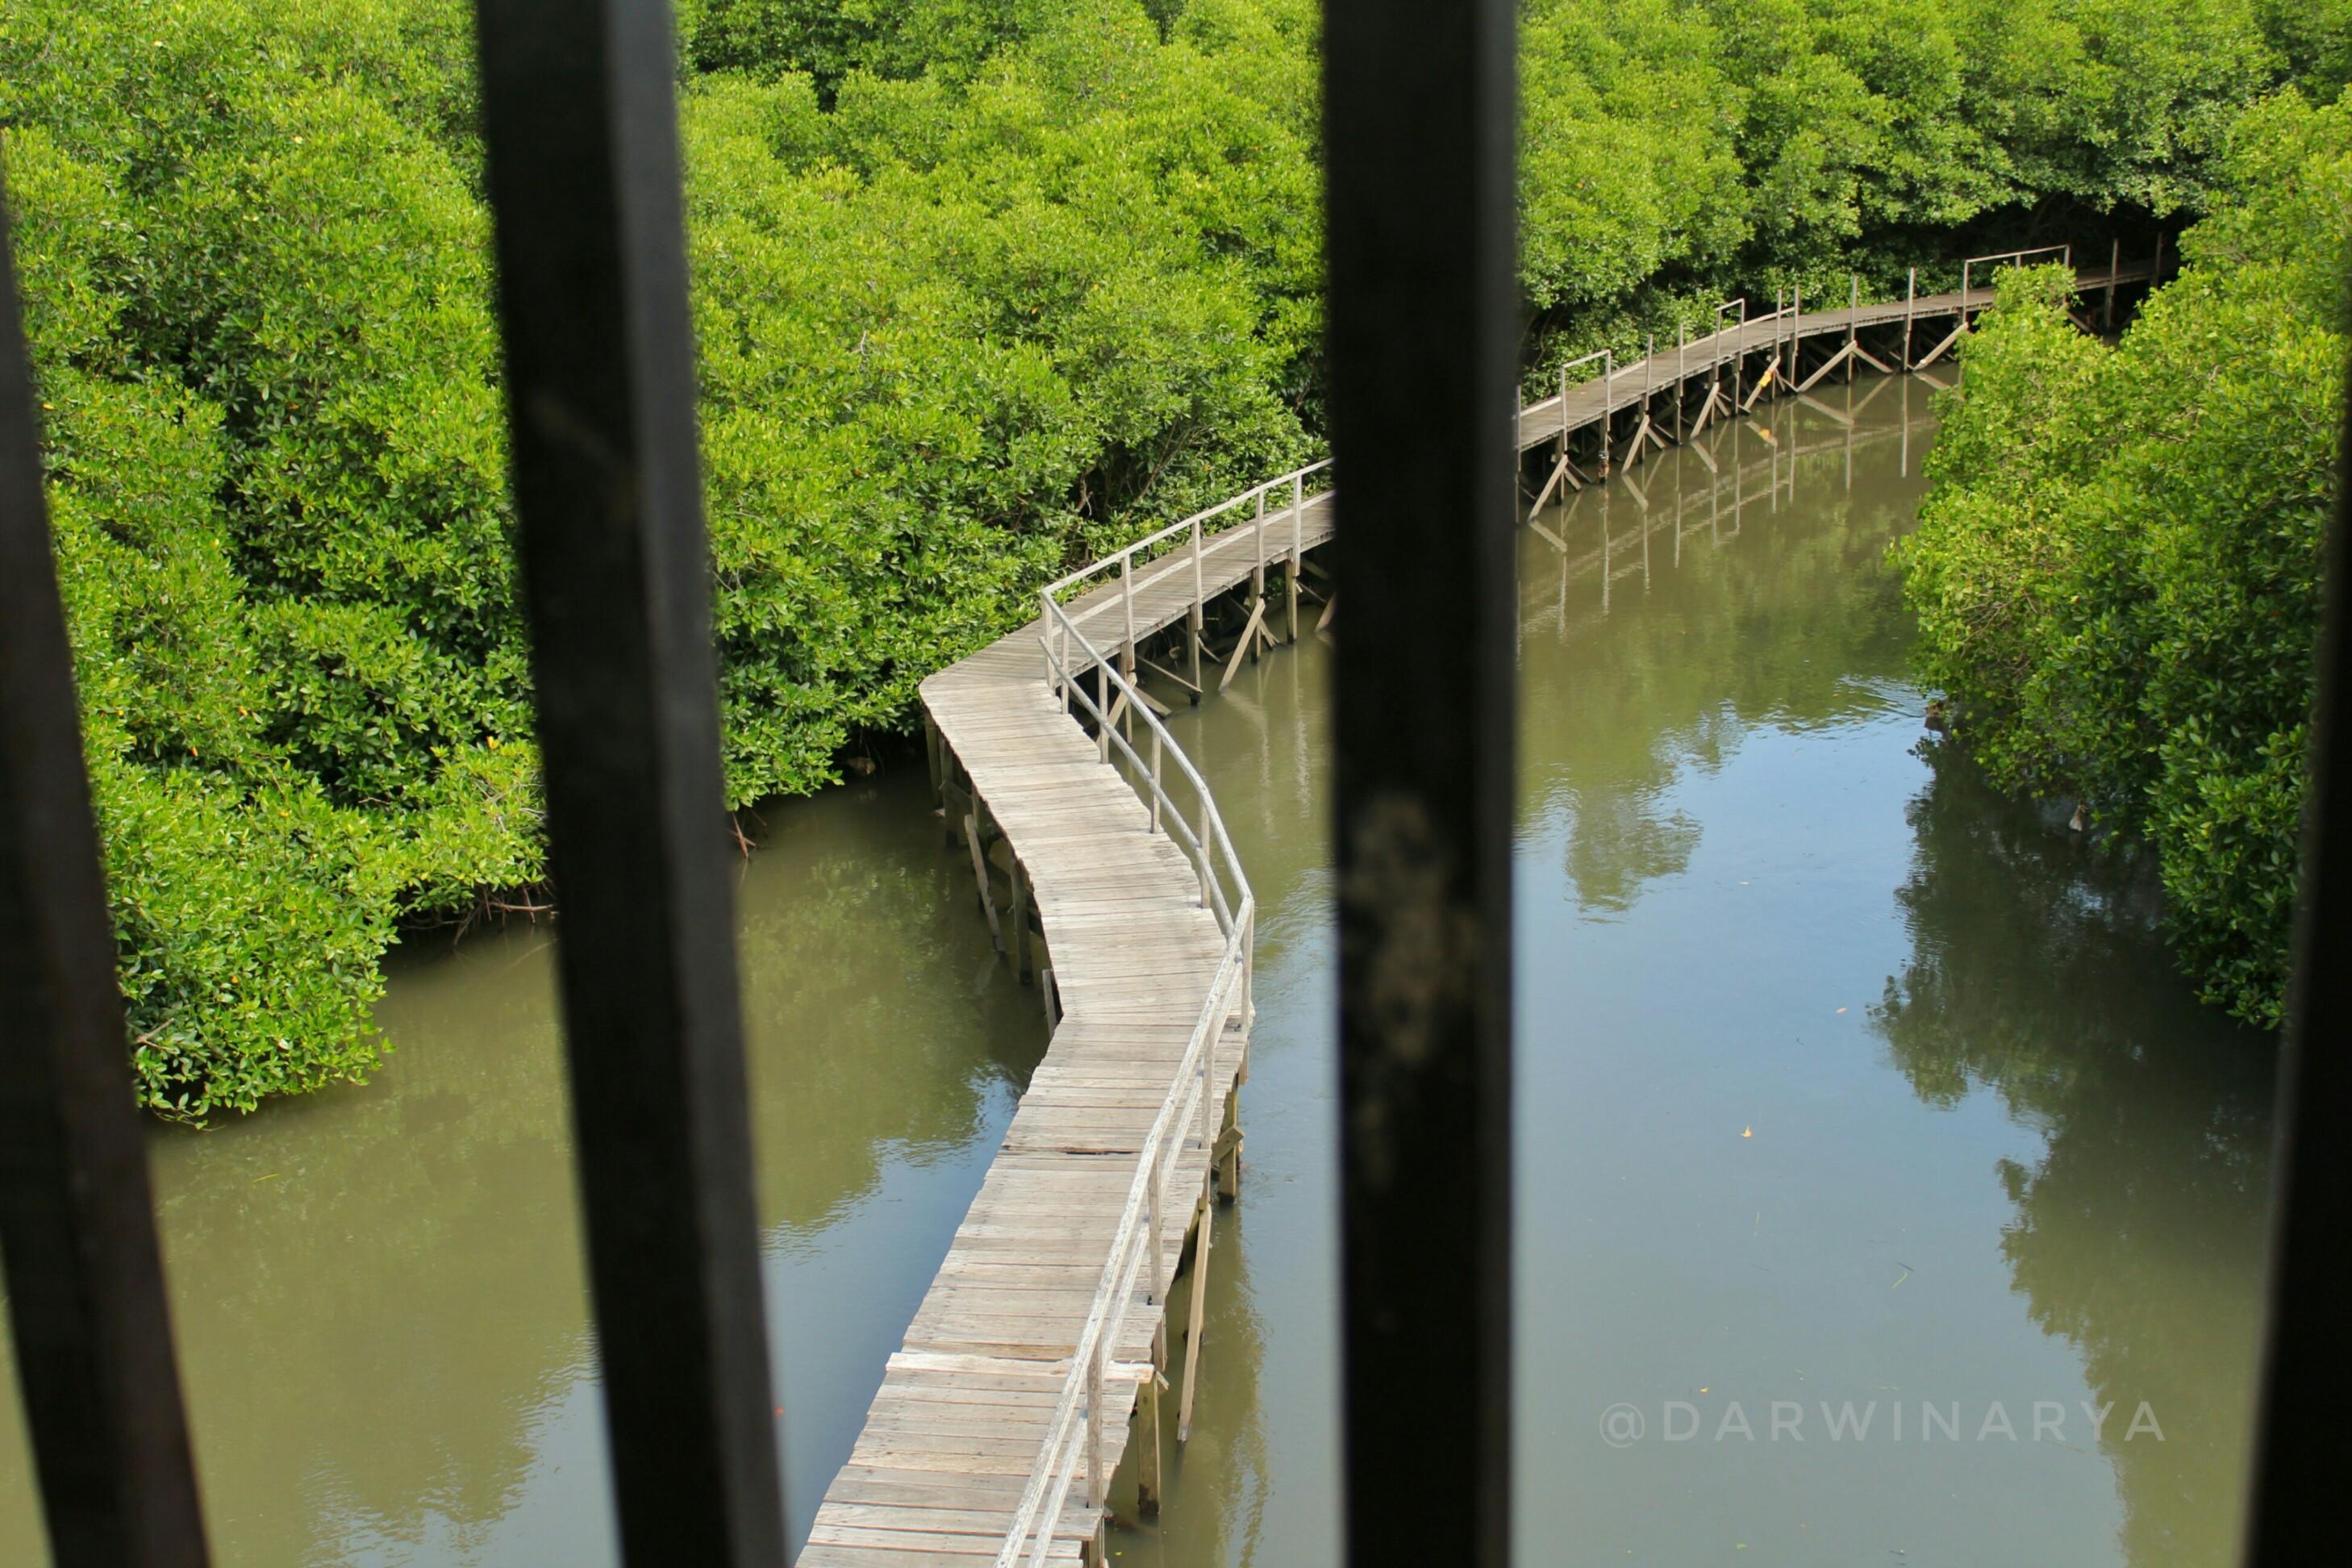 Jembatan Kayu Dilihat dari Tower. Tampak Mirip Sungai Amazon / dap